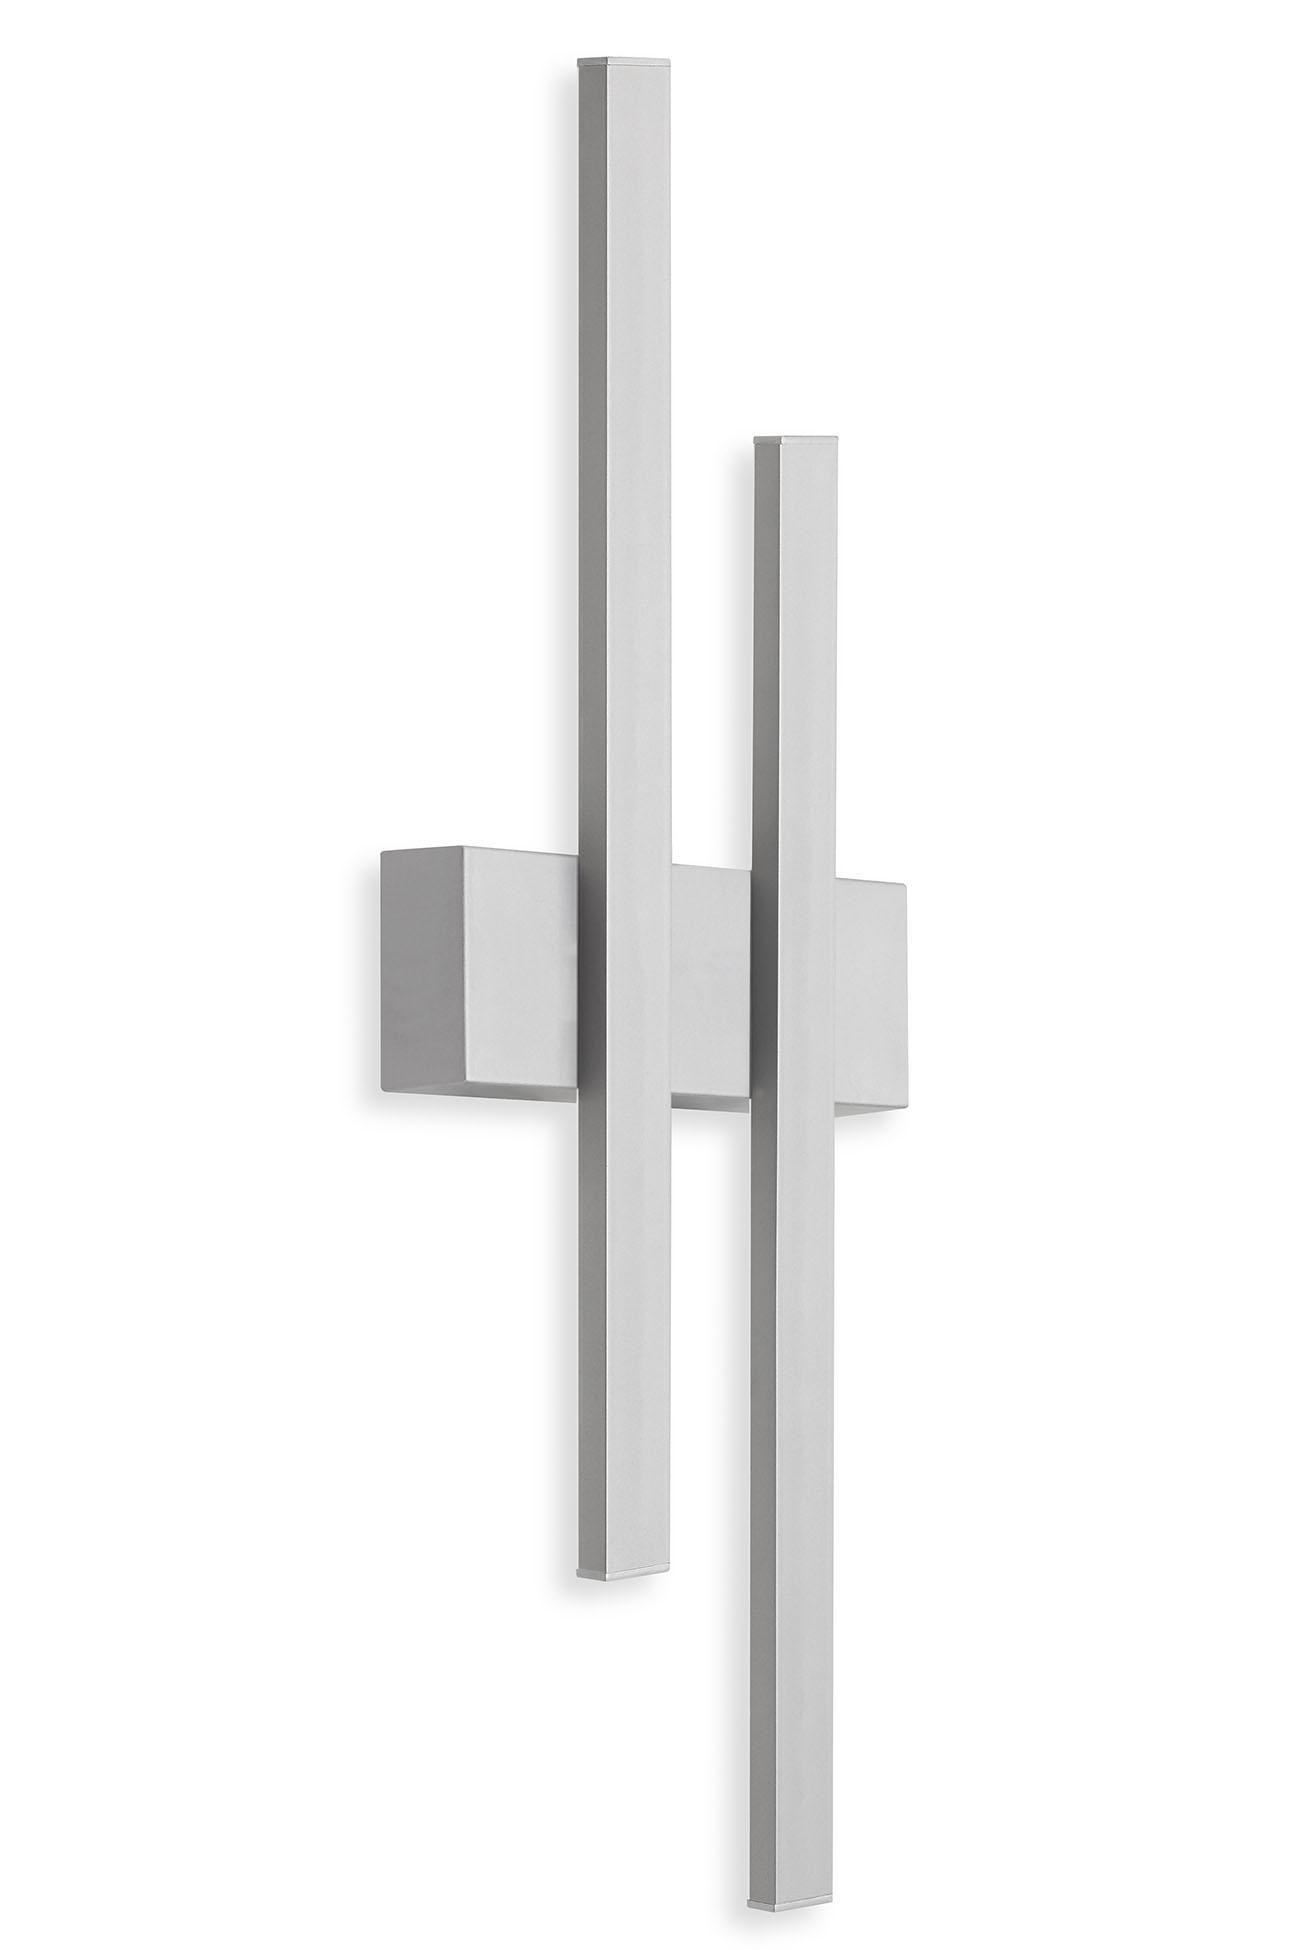 TELEFUNKEN LED Aussenwandleuchte, 47 cm, 8 W, Silber